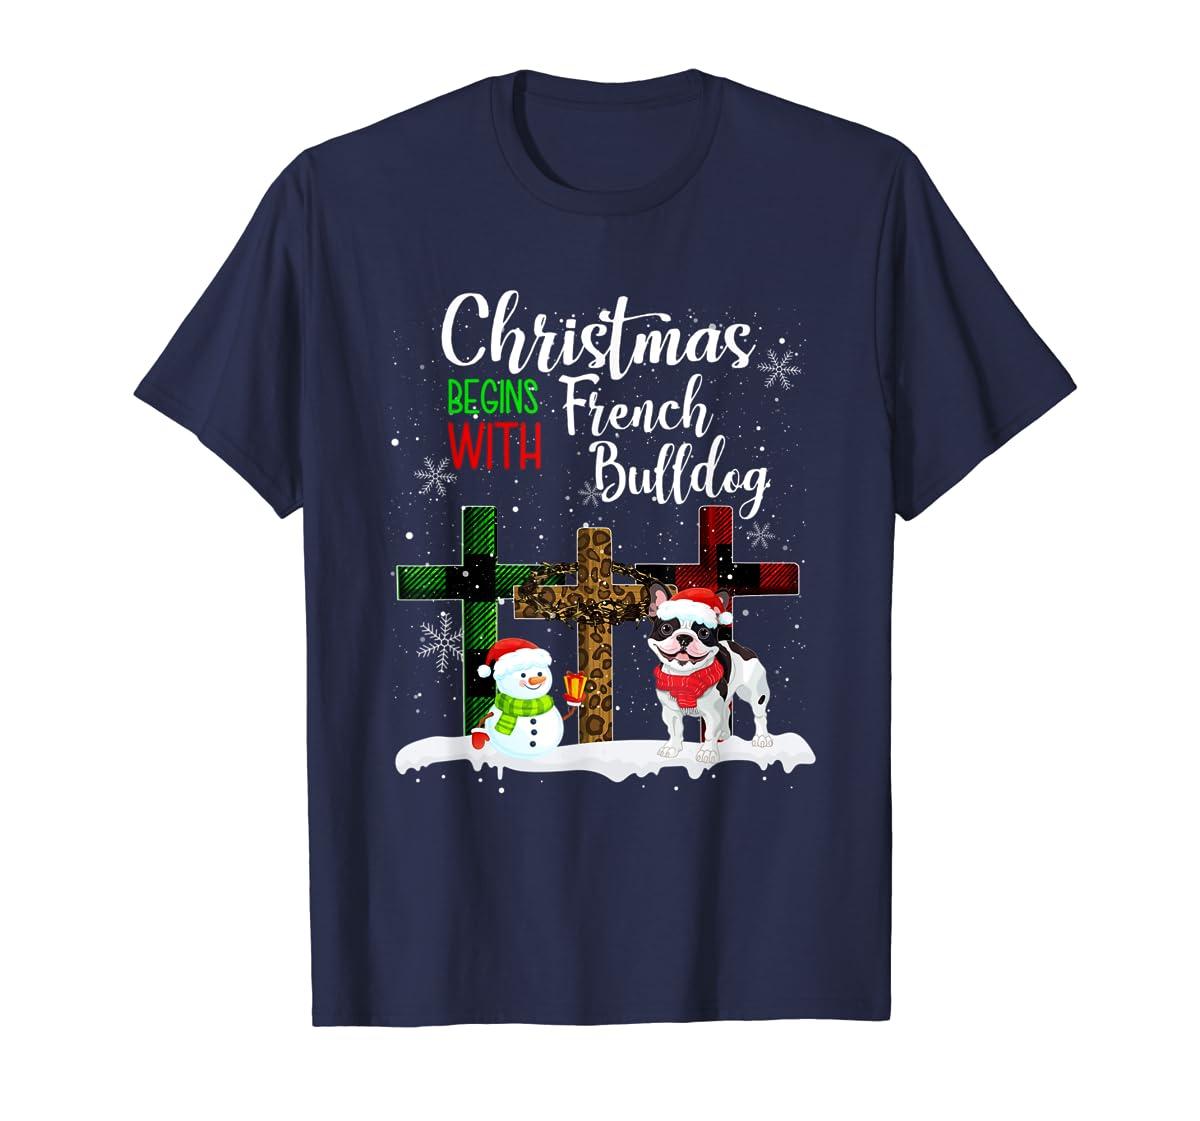 Christmas Begins With French Bulldog Costume Xmas Gifts T-Shirt-Men's T-Shirt-Navy